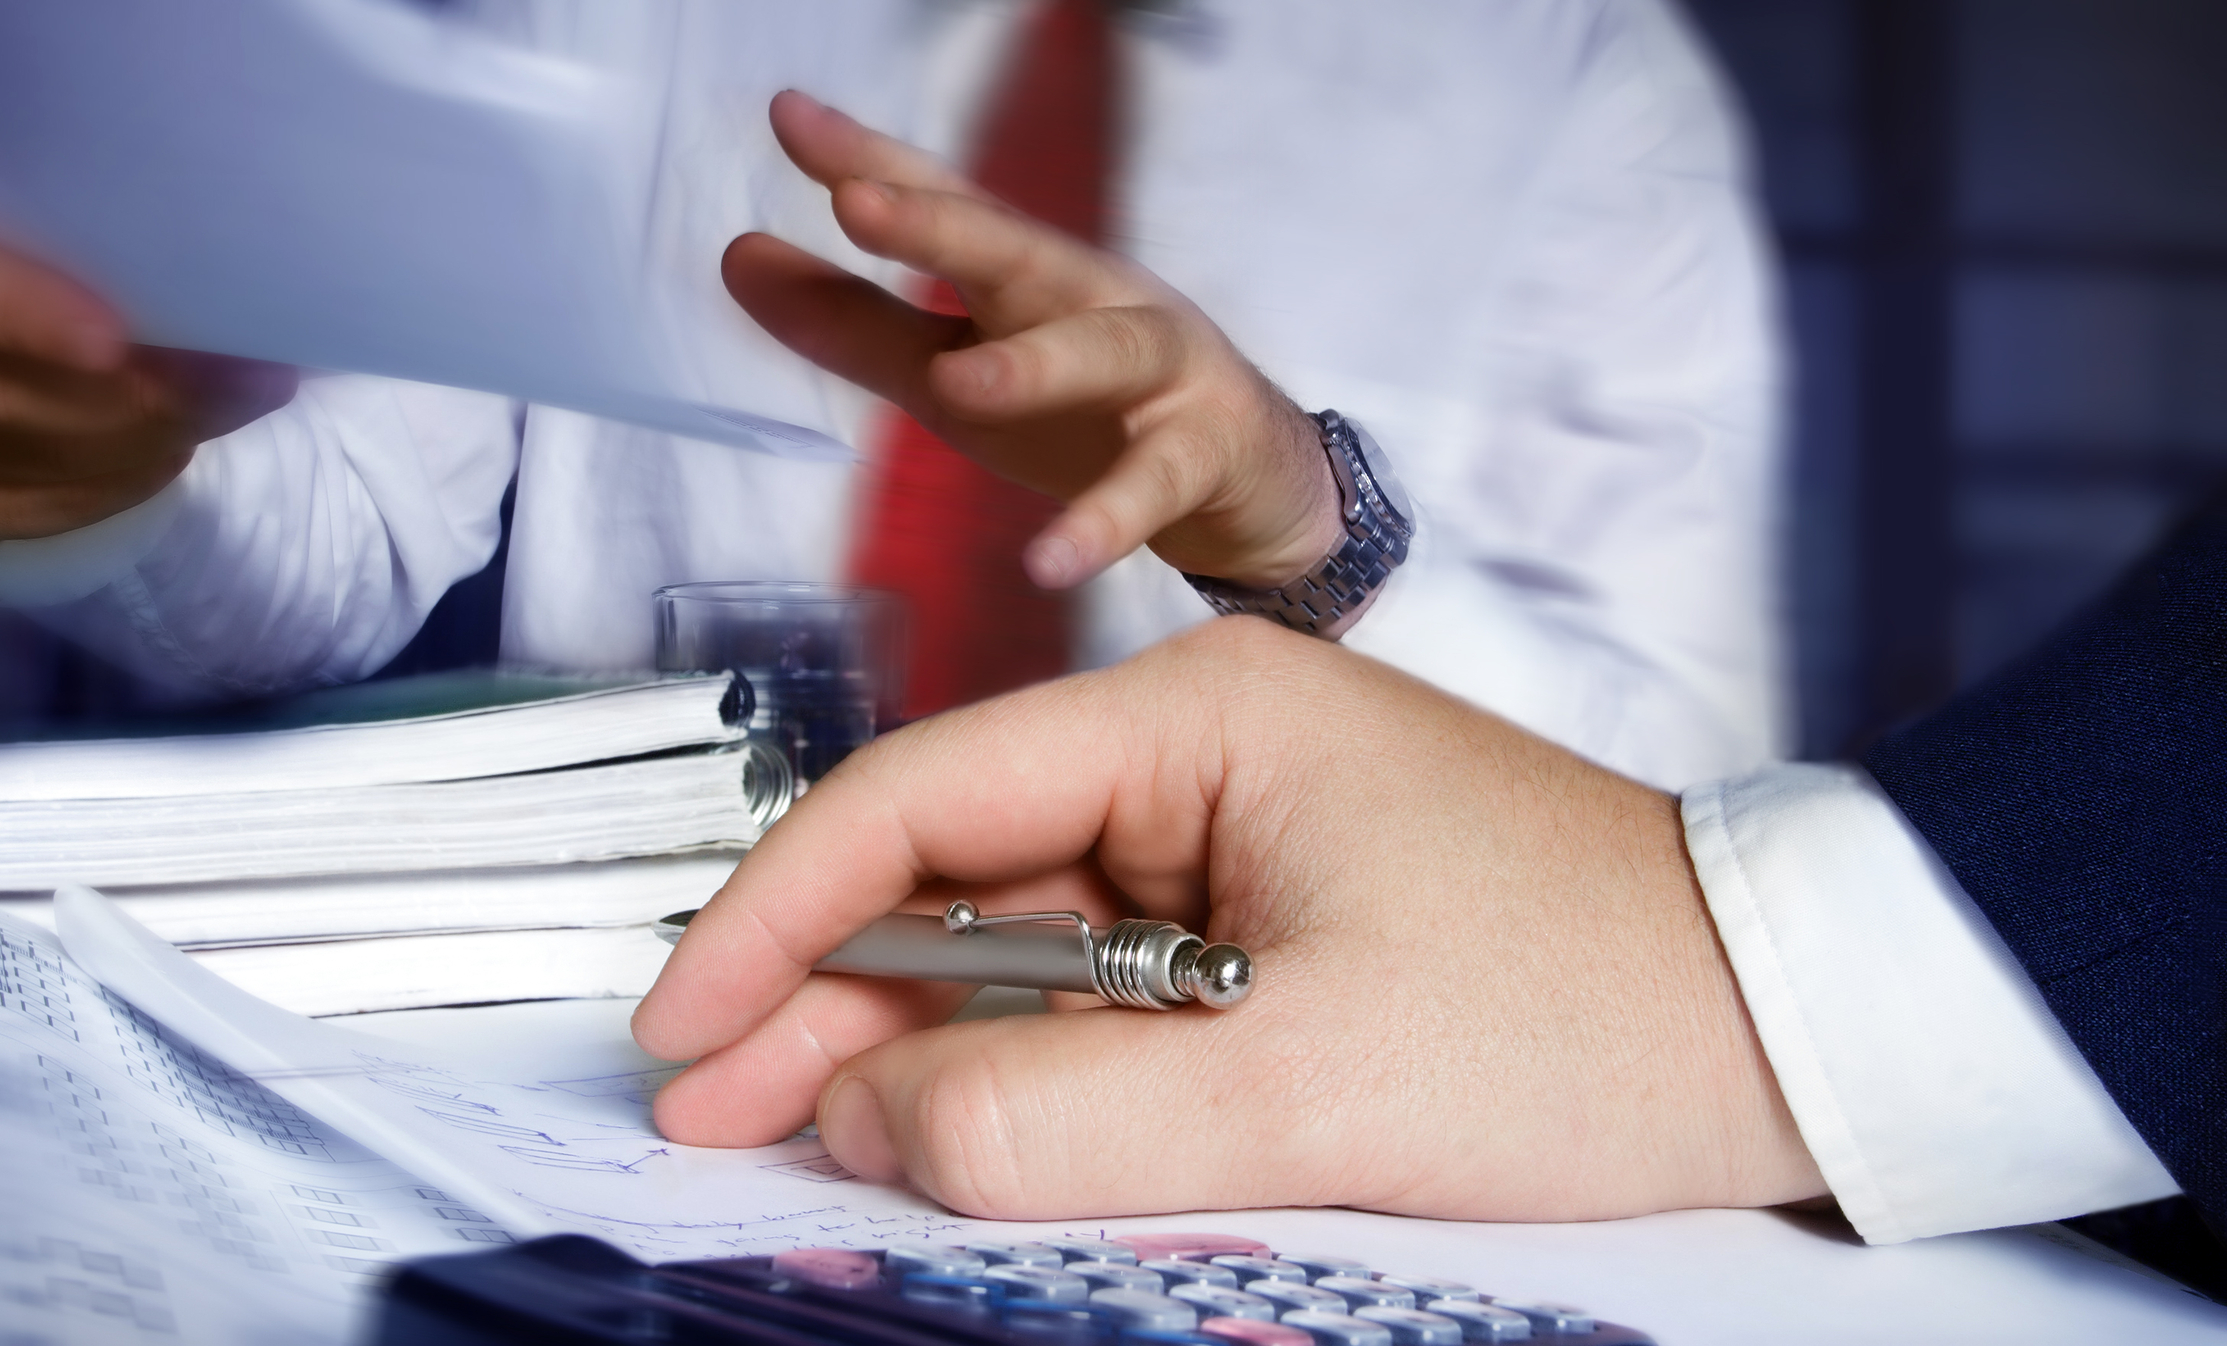 Dissertation proposal for knowledge management system